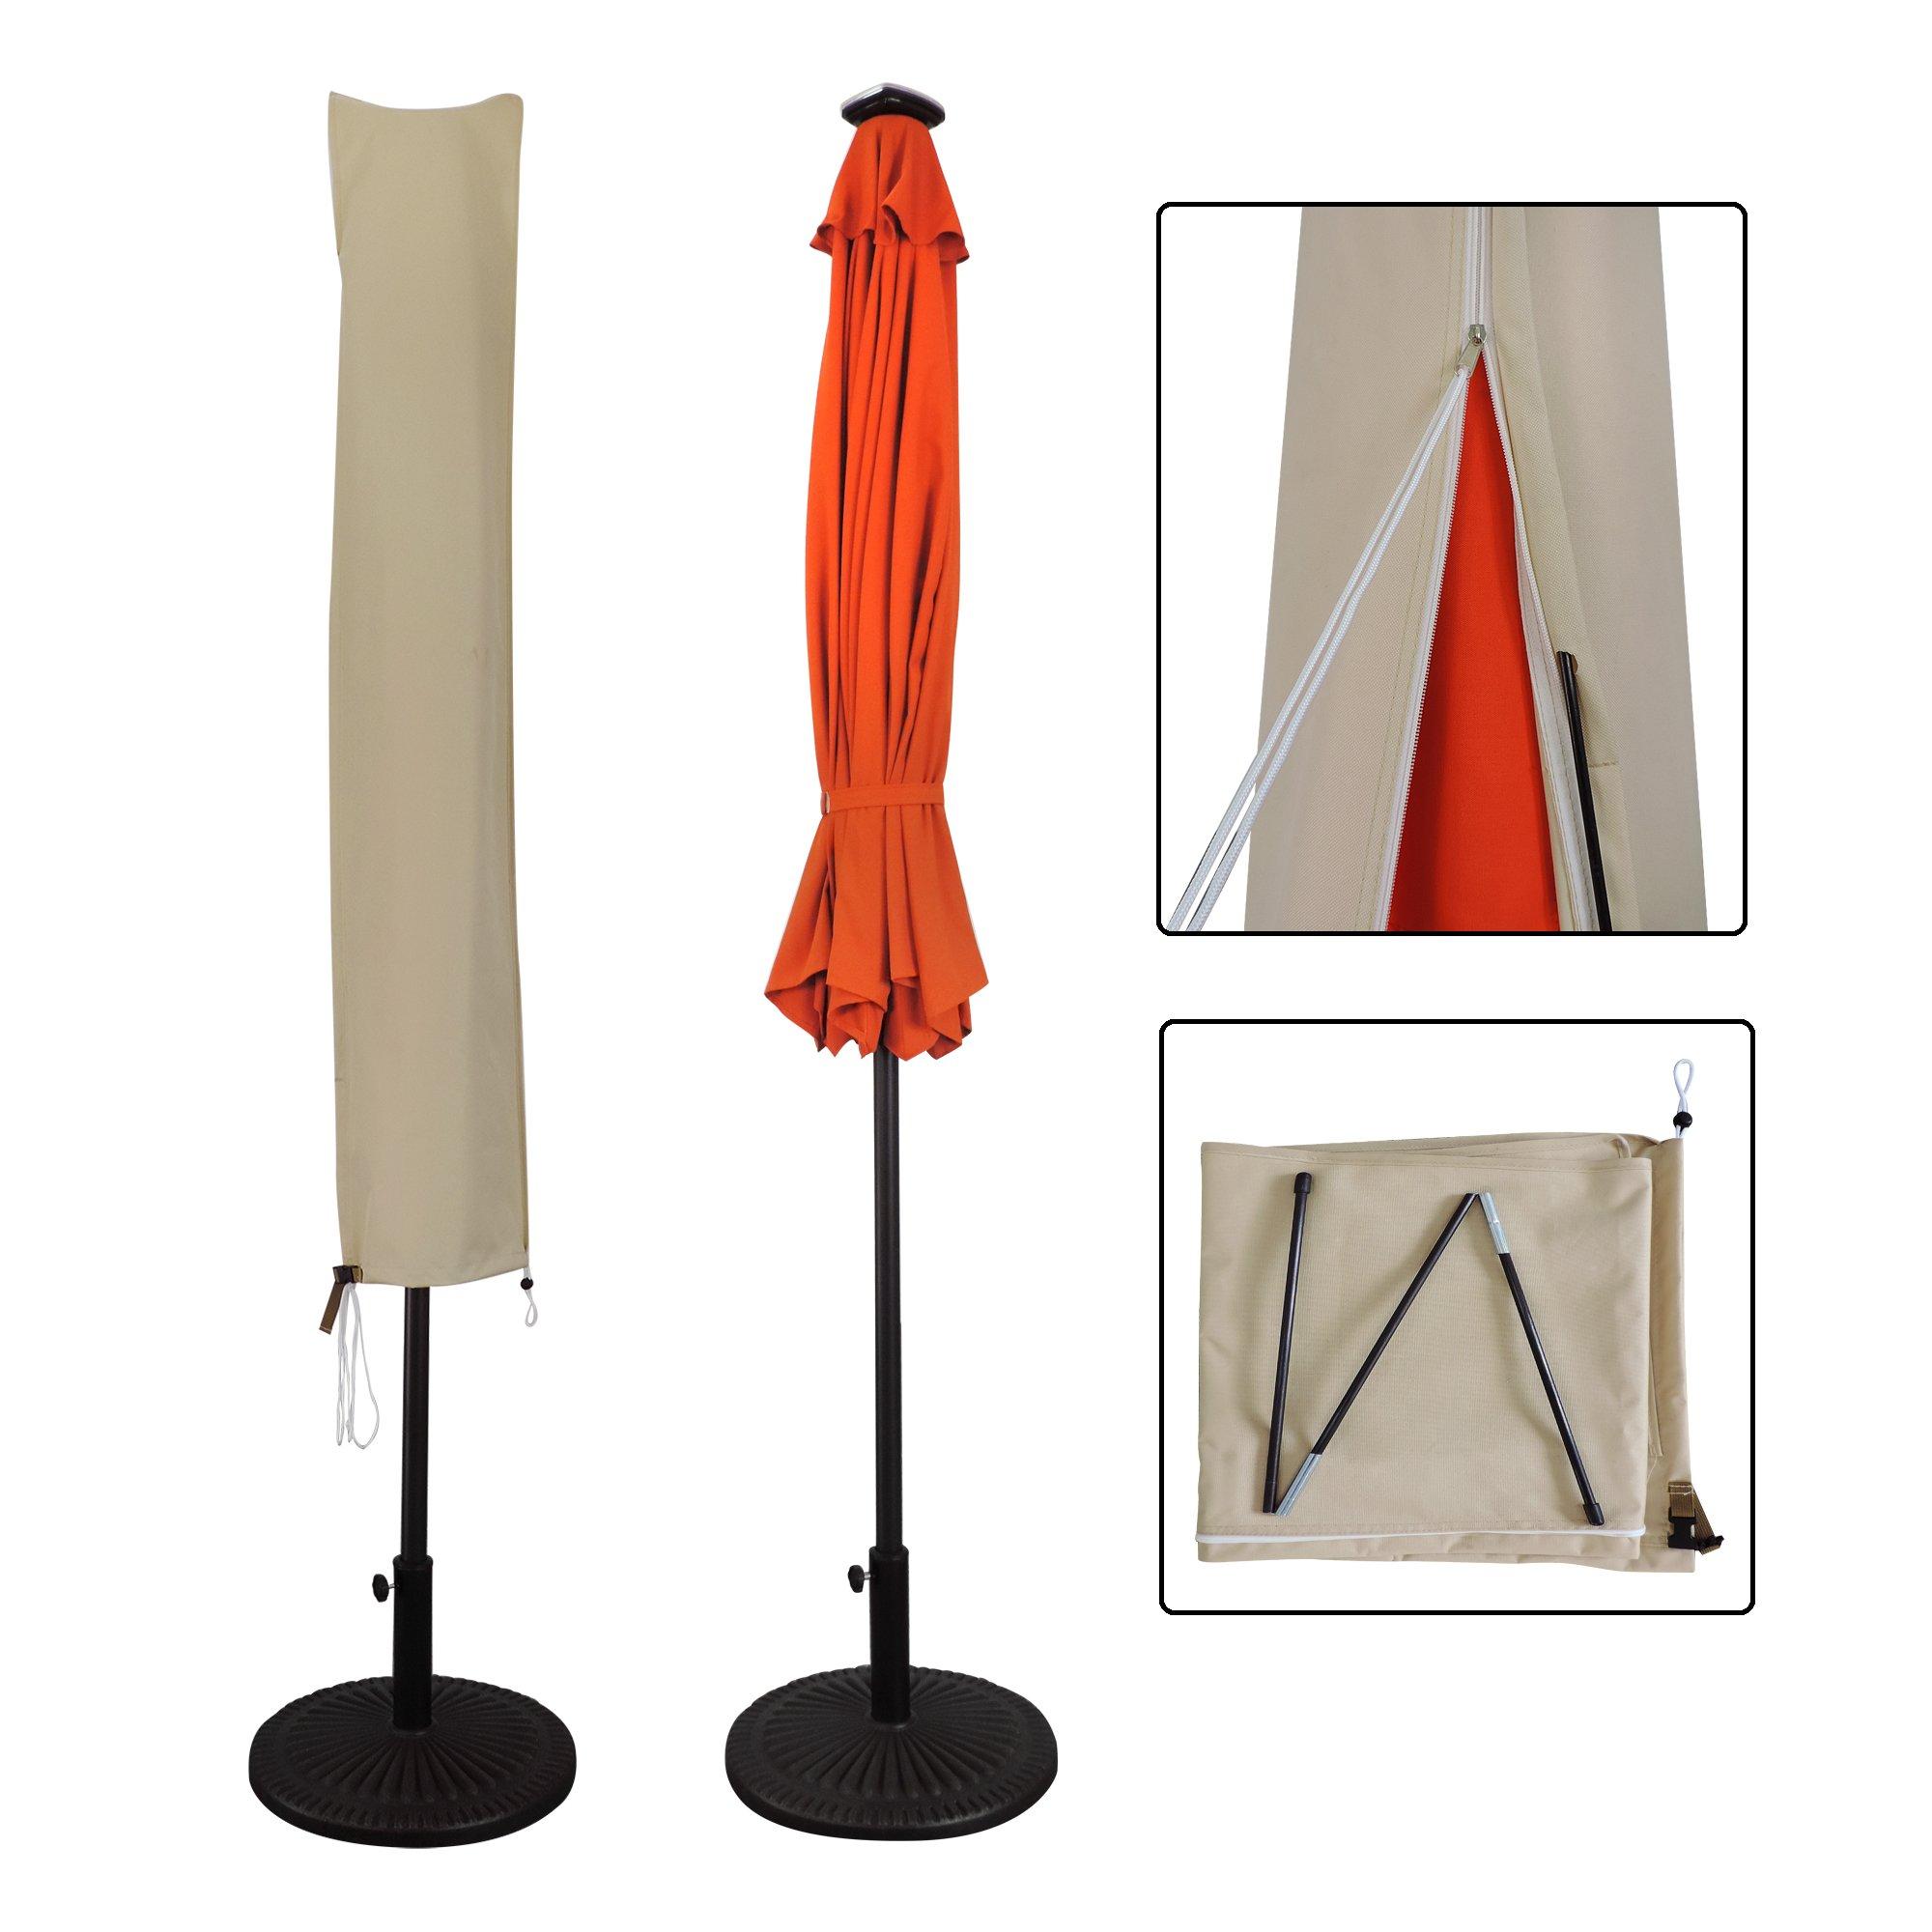 Aok Garden Outdoor Market Patio Umbrella Covers for 7 to 11 FT Umbrella,Water Resistant,Beige,Oxford Fabric